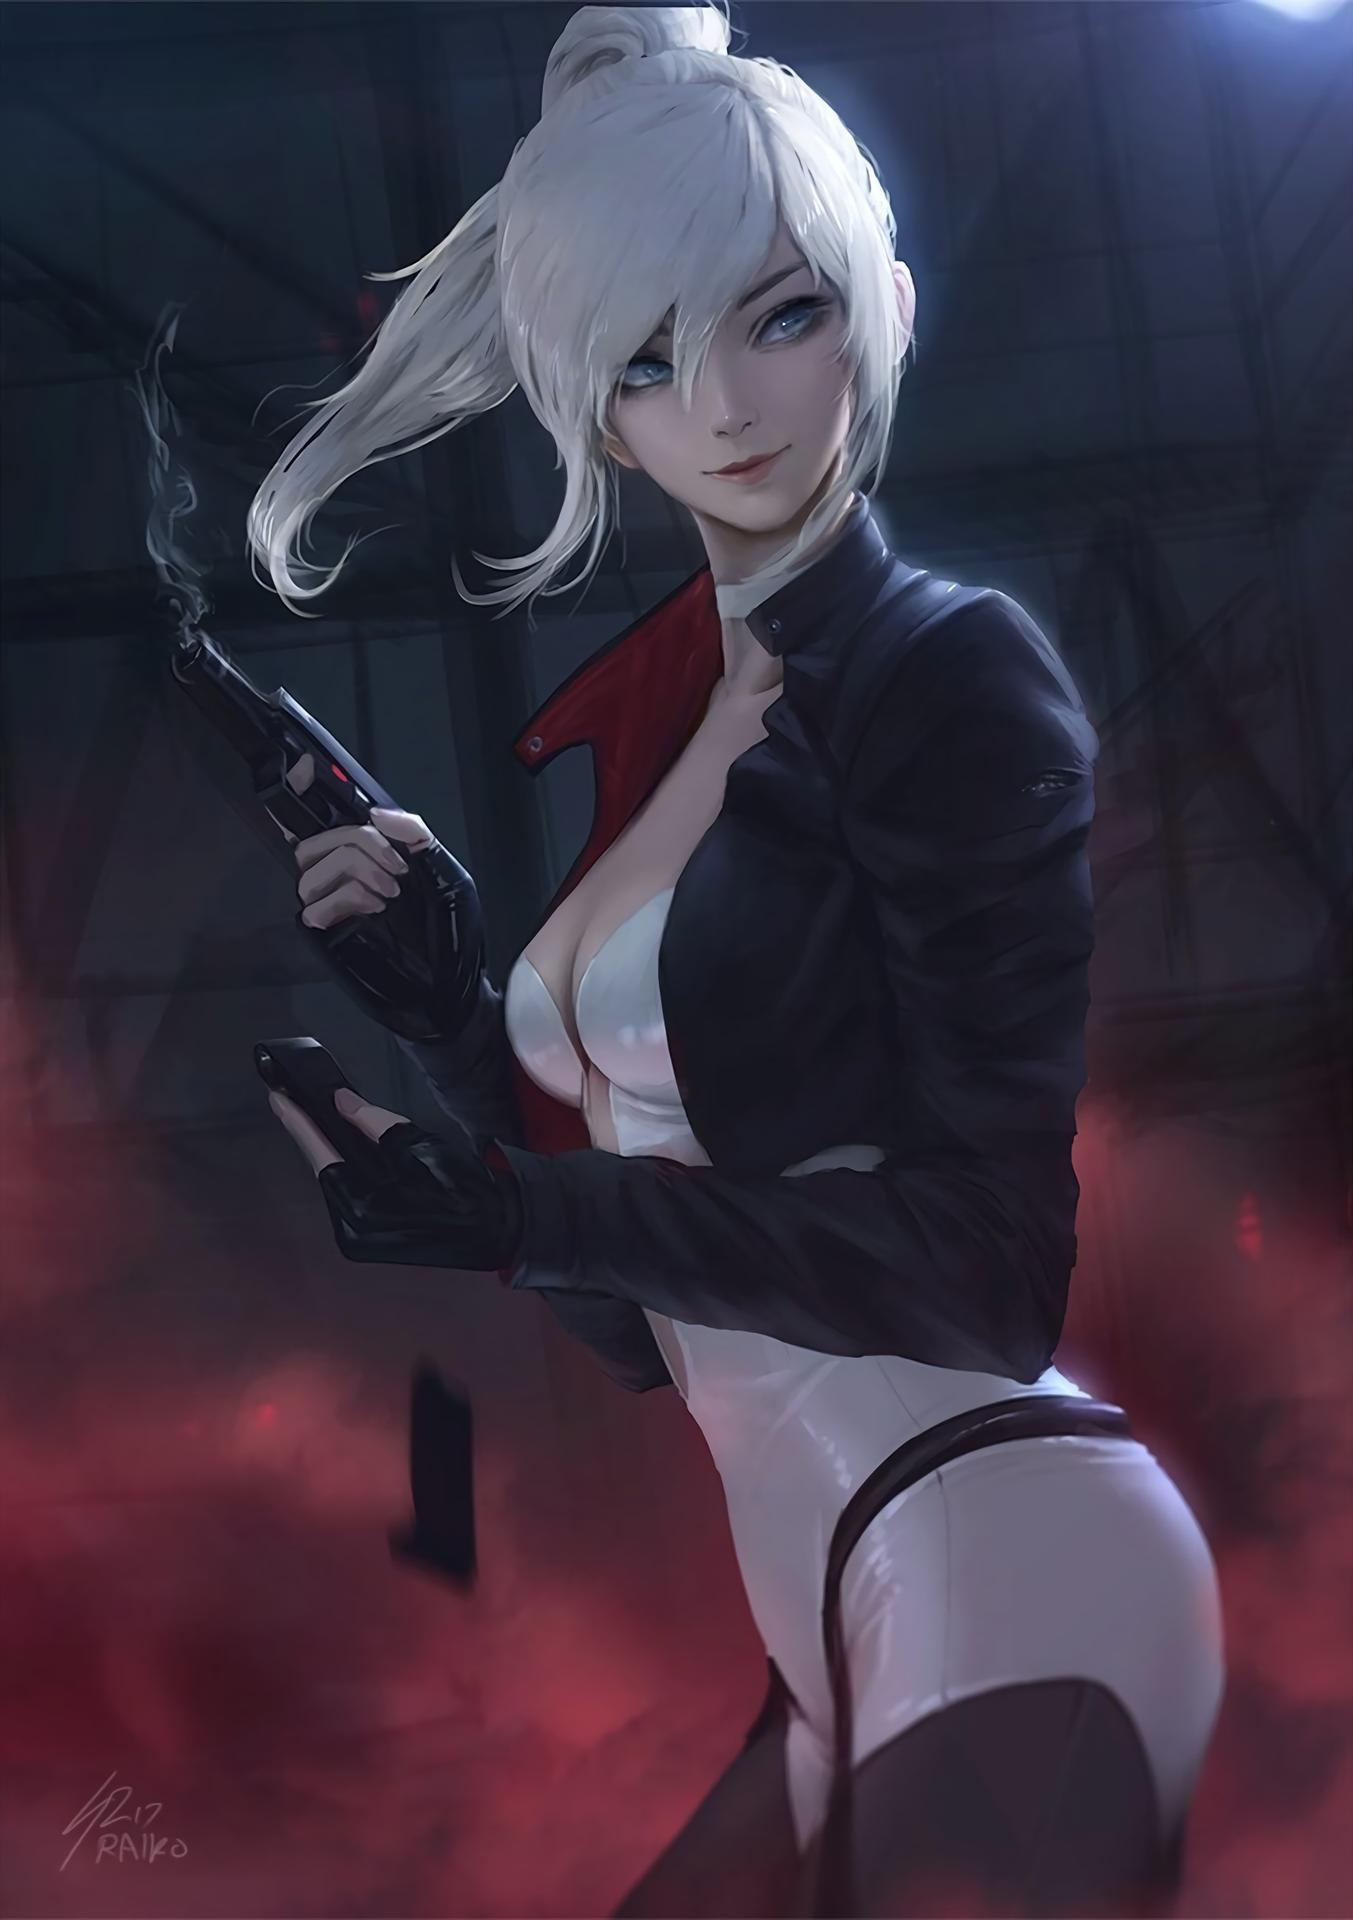 Wallpaper : anime girls, women, white hair, ponytail ...  Wallpaper : ani...